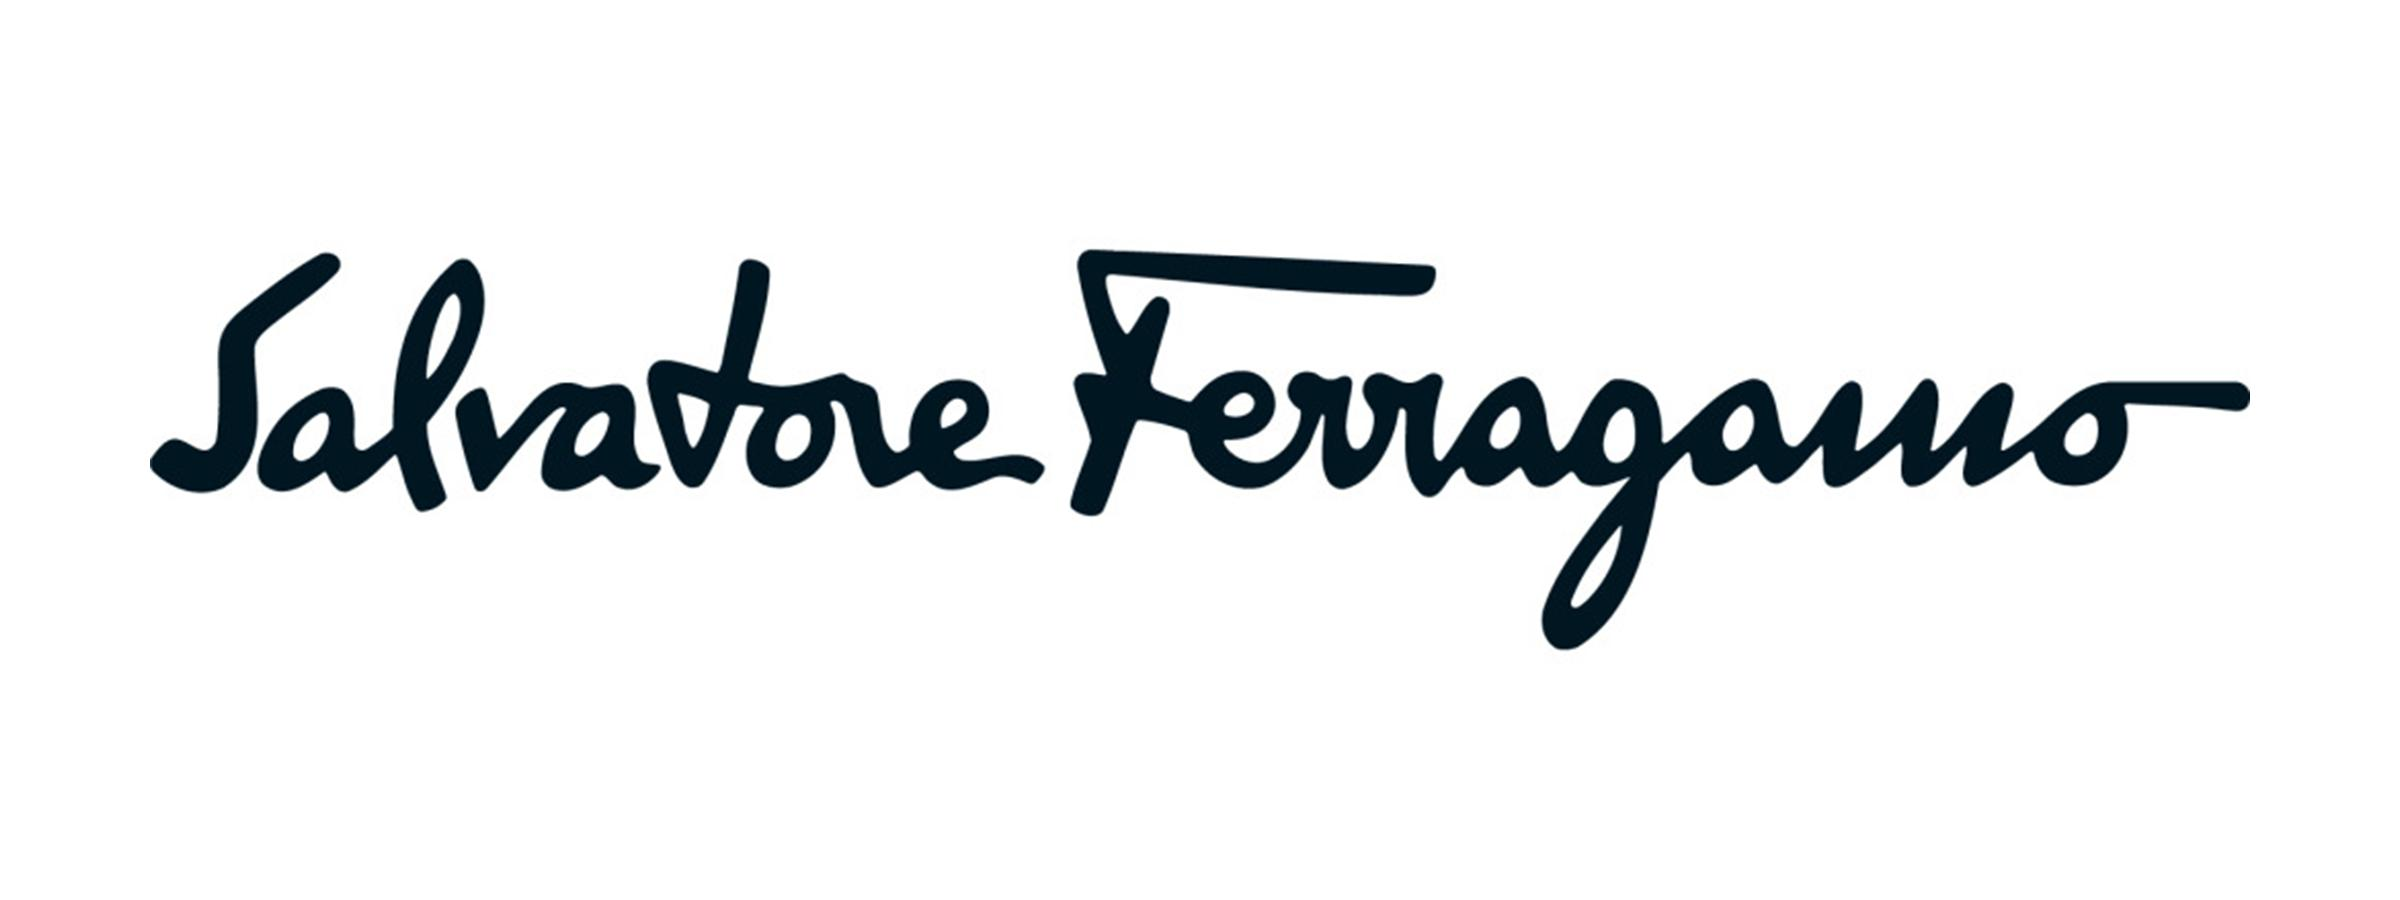 Image result for Ferragamo